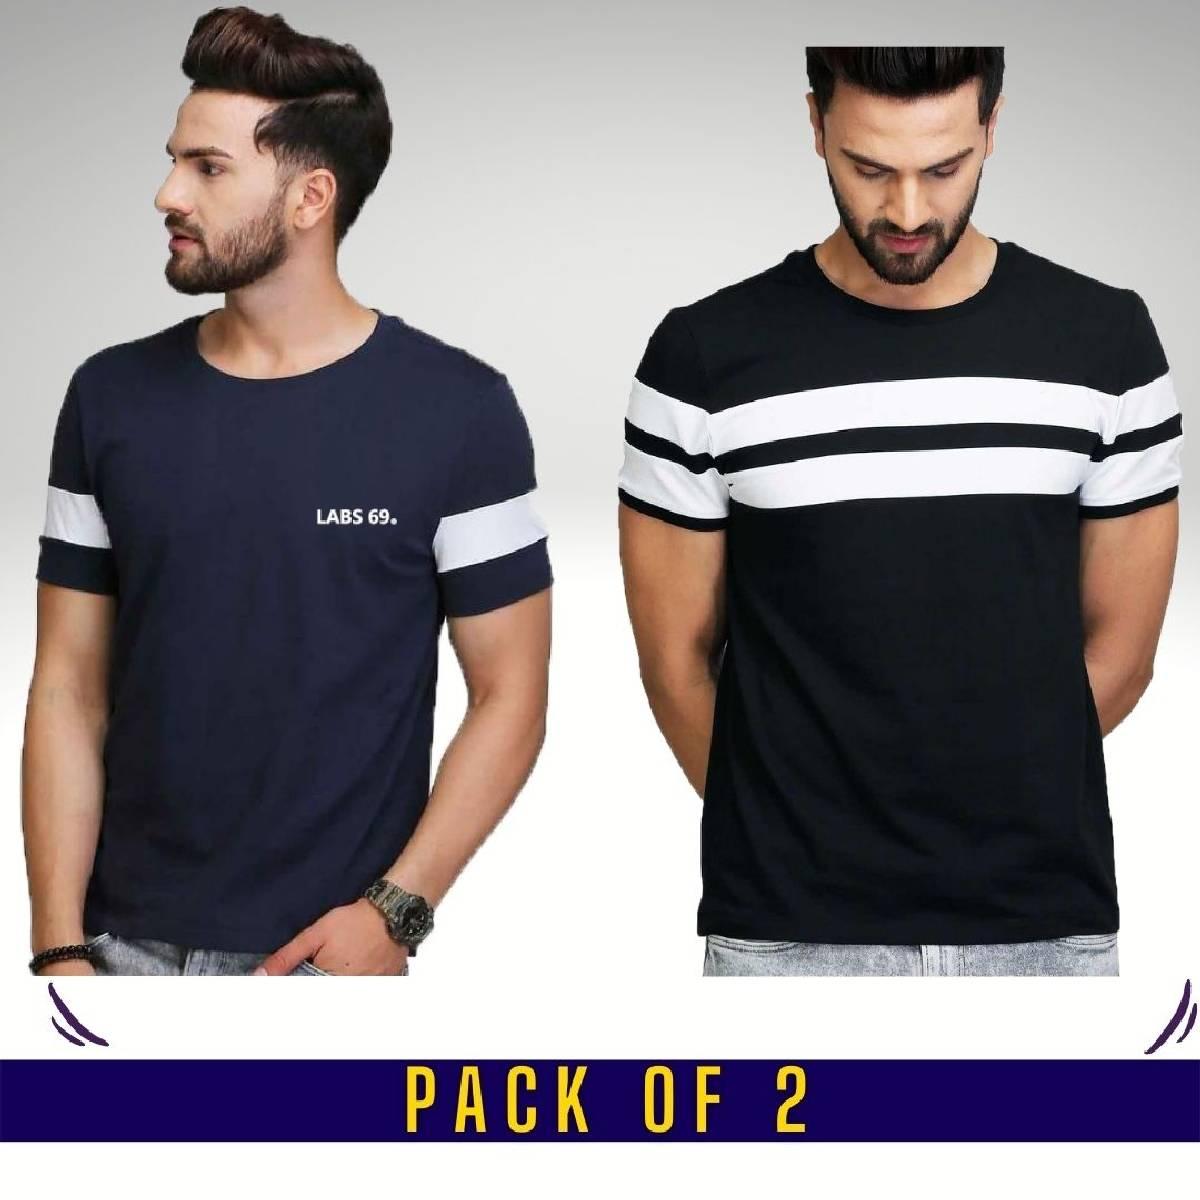 High Quality Pack of 2 Half Sleeves Designer T-shirts For Men For Summer